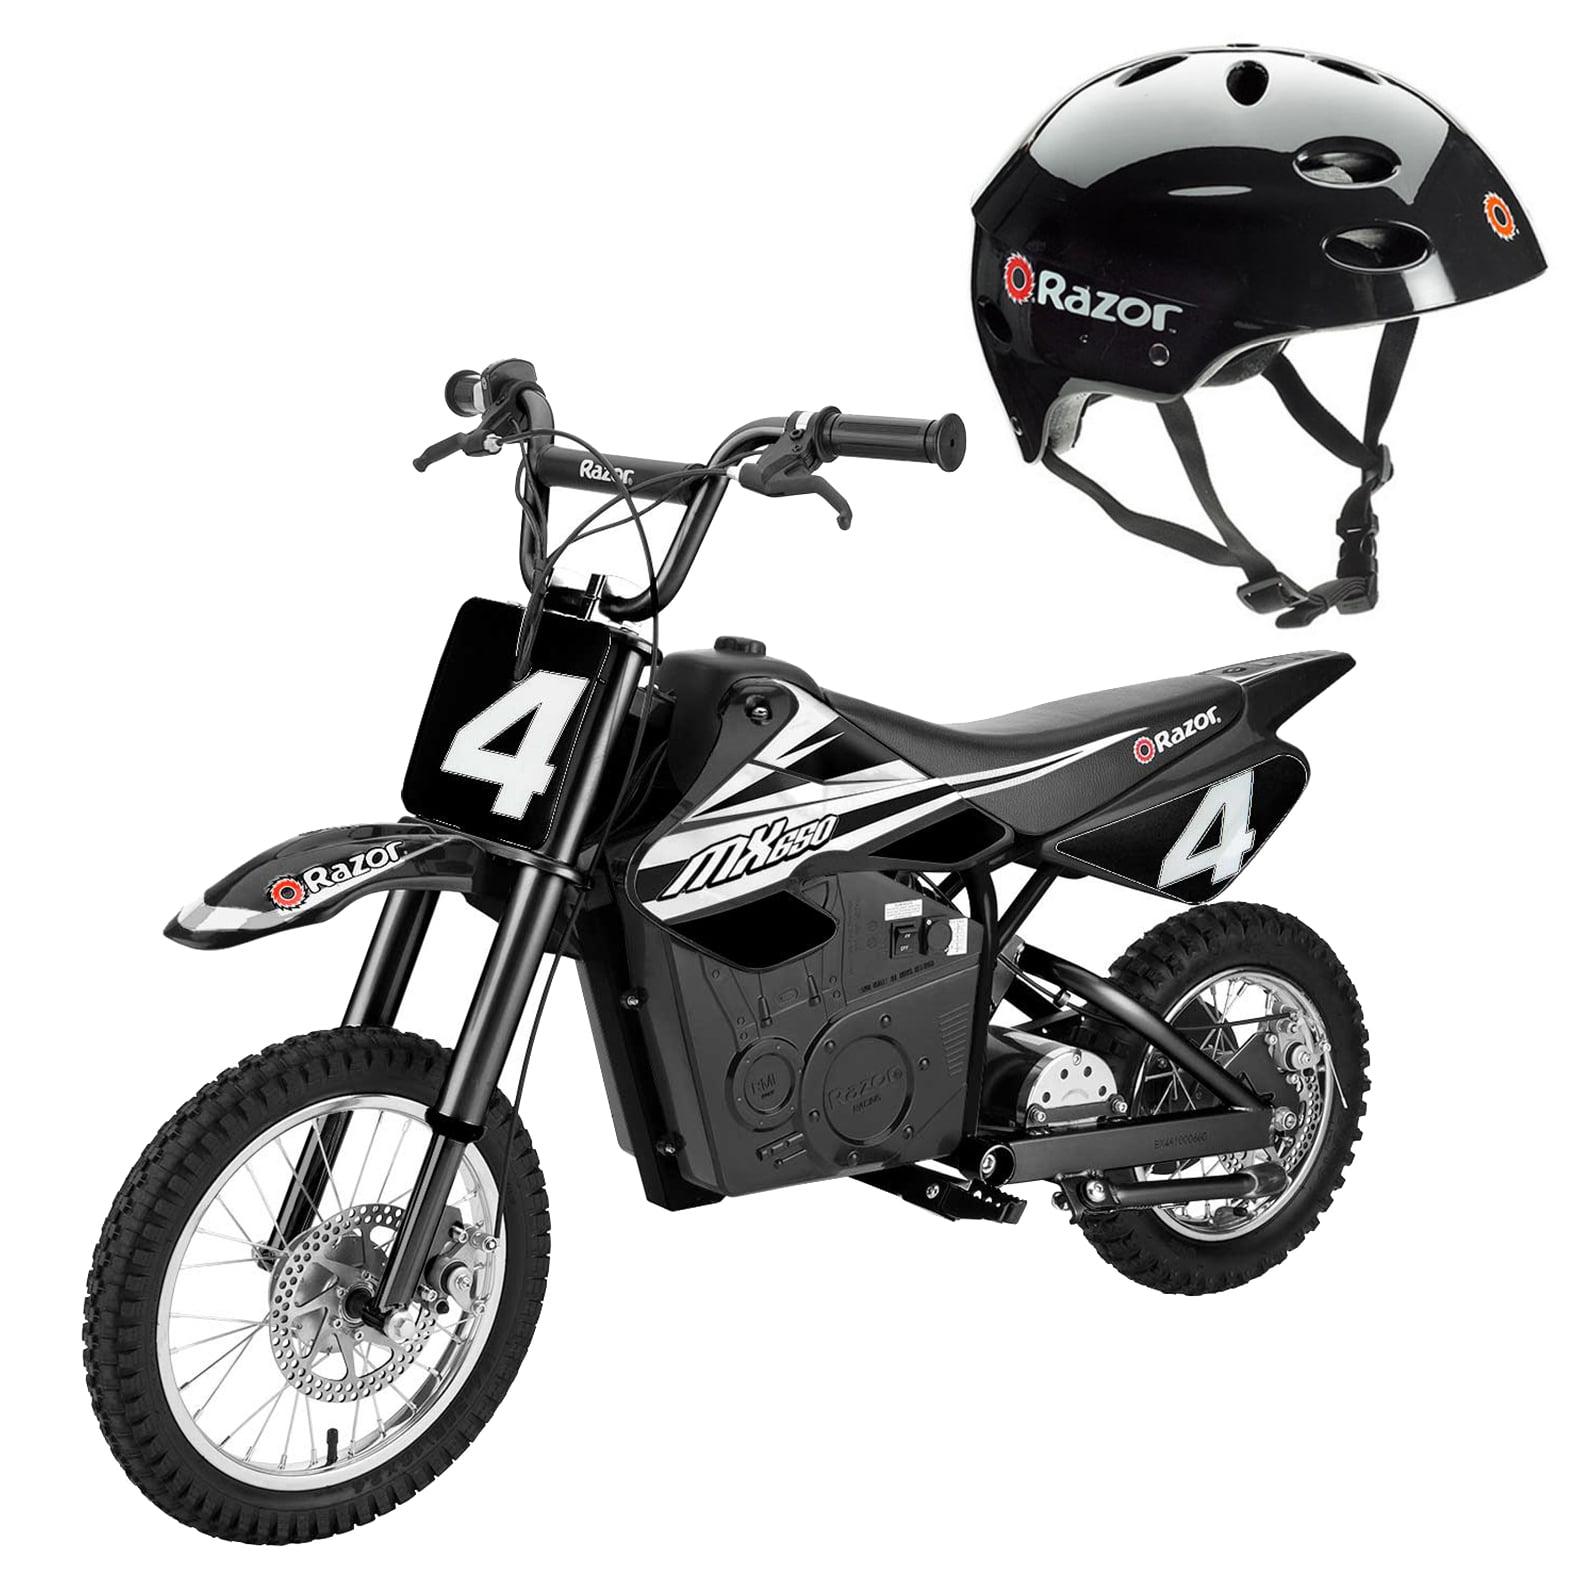 Razor MX650 Electric Dirt Rocket Motor Bike for Kids 12 & Up + V17 Youth Helmet